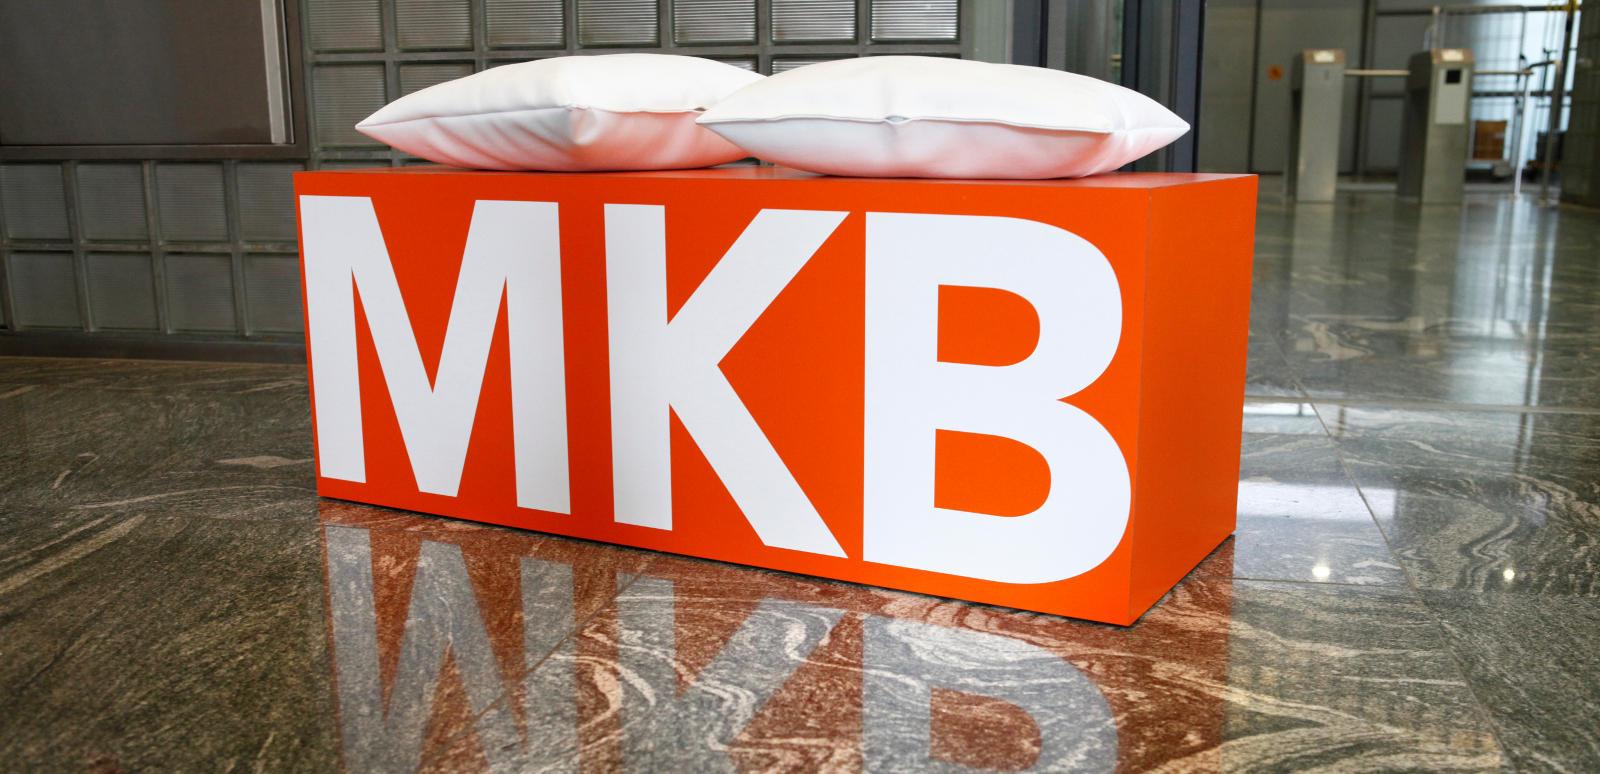 MKB-Nederland gaat nauwer samenwerken met VNO-NCW